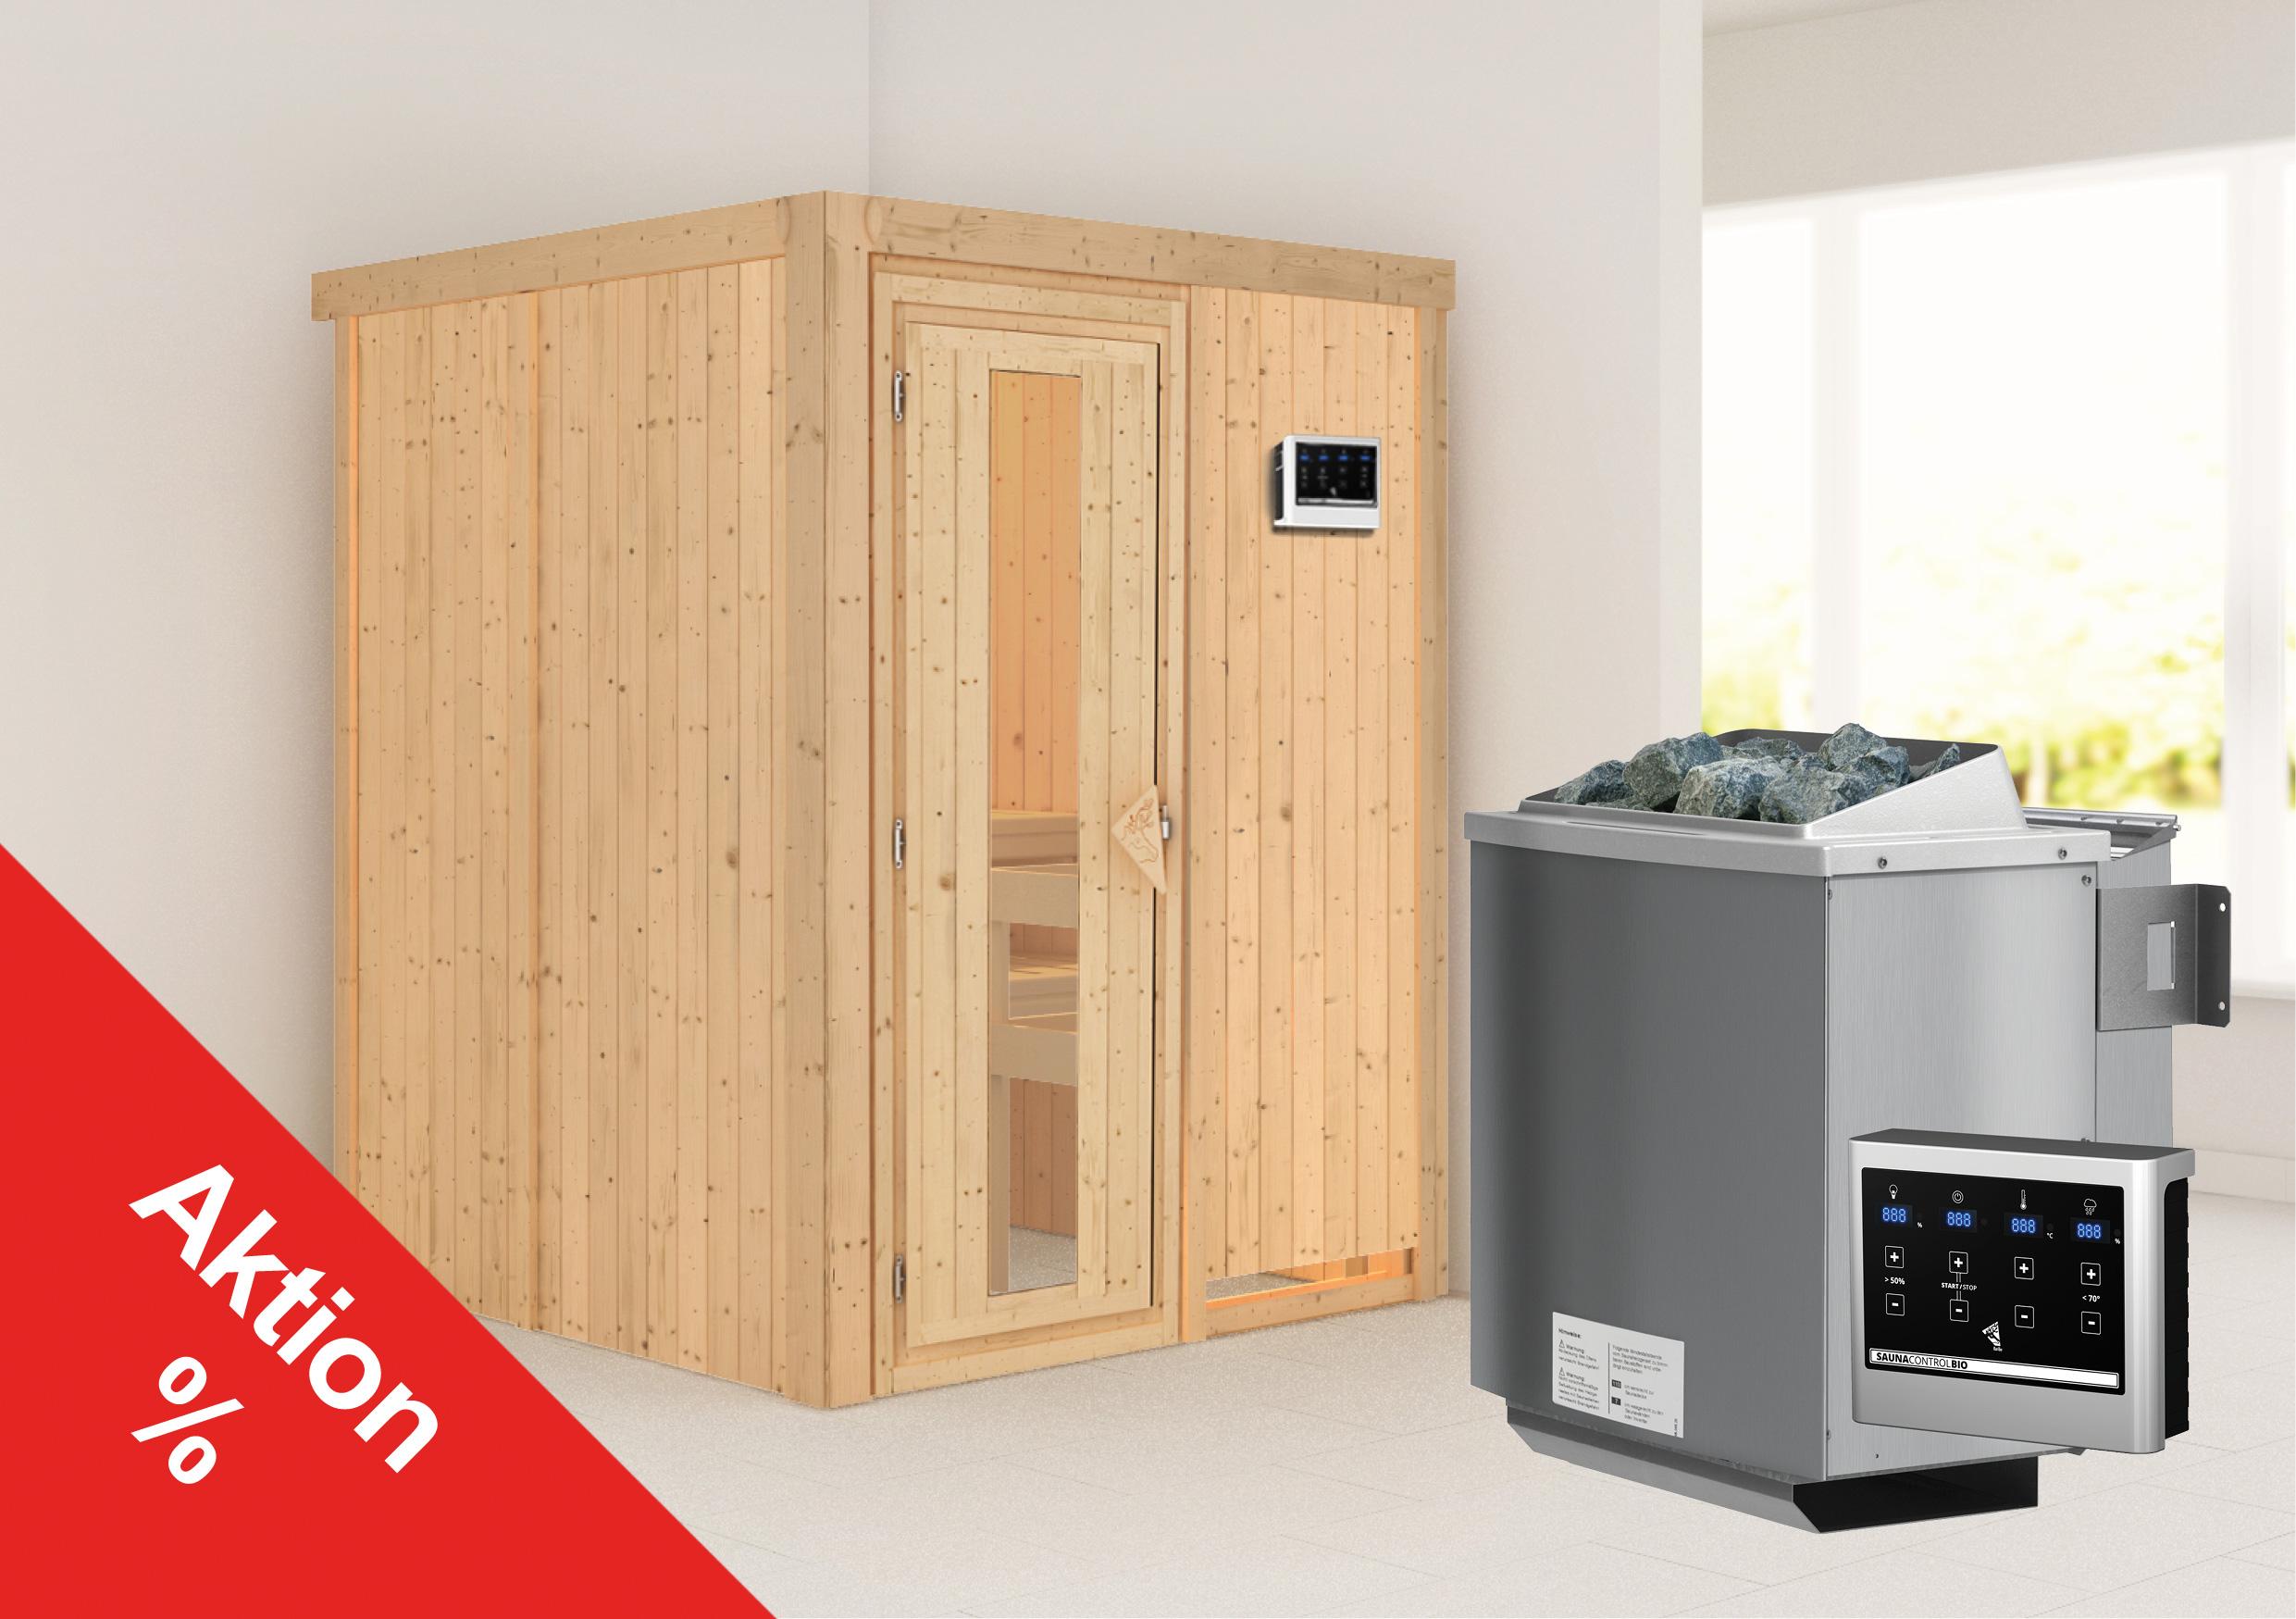 Karibu Sauna Sorina 68mm mit Bio Saunaofen 9kW extern Holztür Aktion Bild 1